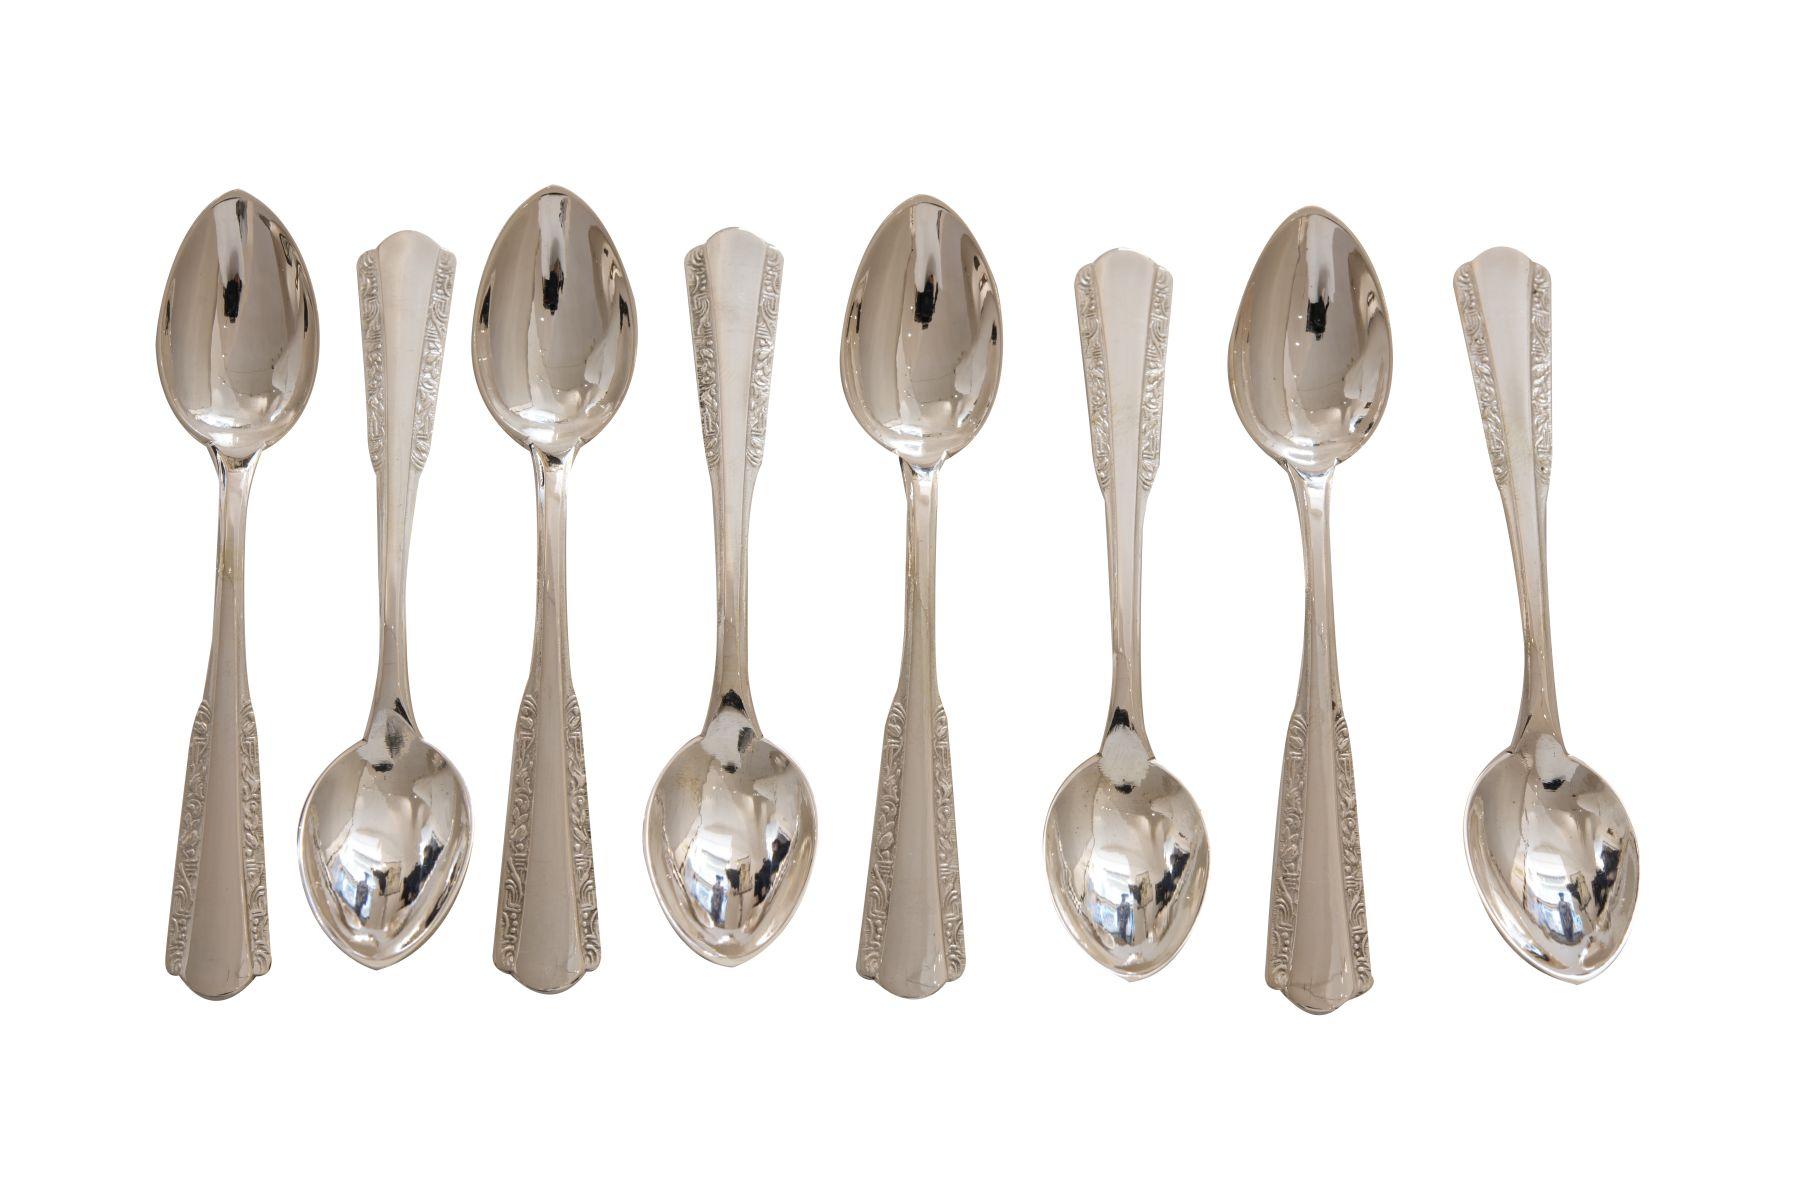 #55 Mocha spoon | 8 Mokkalöffel Image